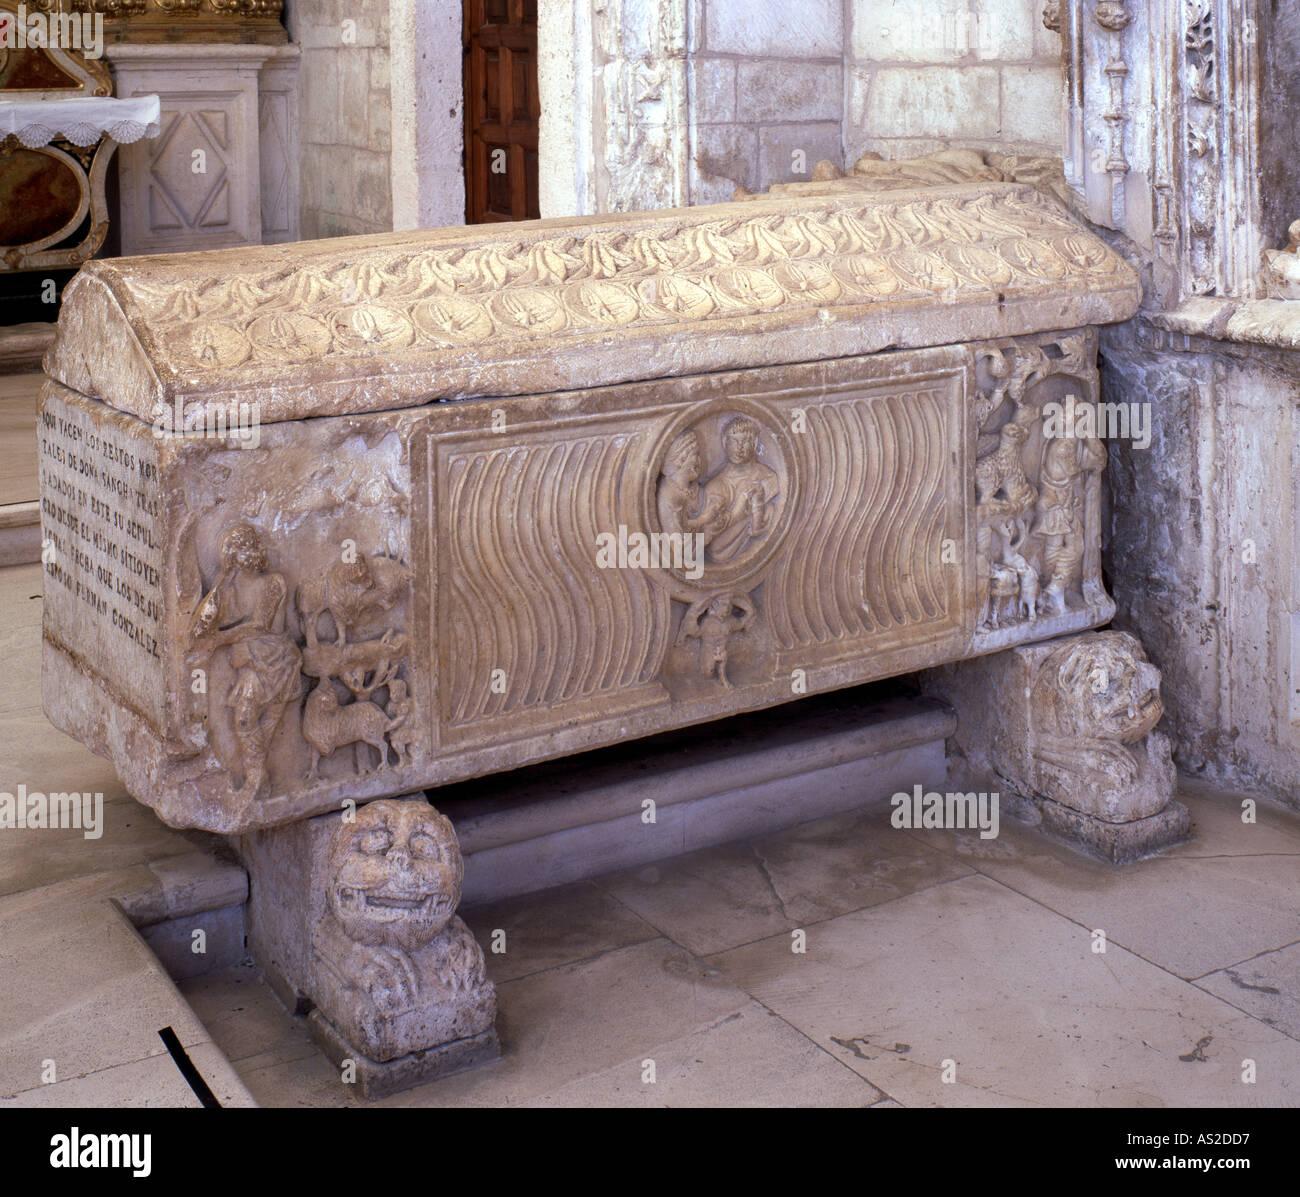 Covarrubias, Colegiata, Römischer Sarkophag - Stock Image